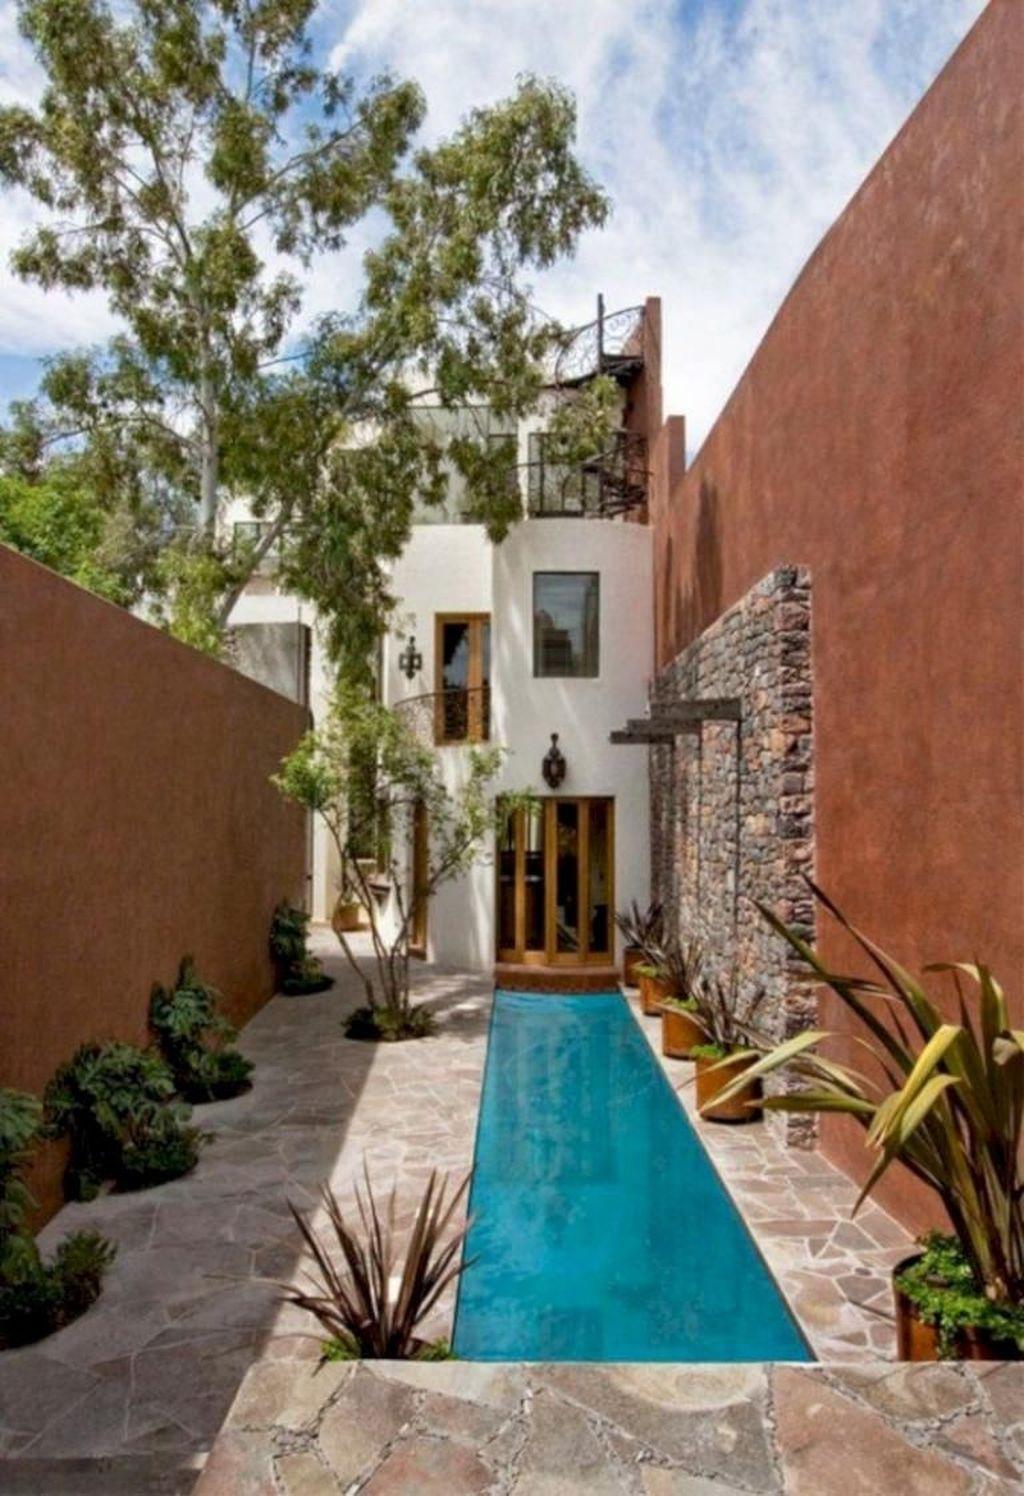 Awesome Backyard Patio Ideas With Beautiful Pool 30